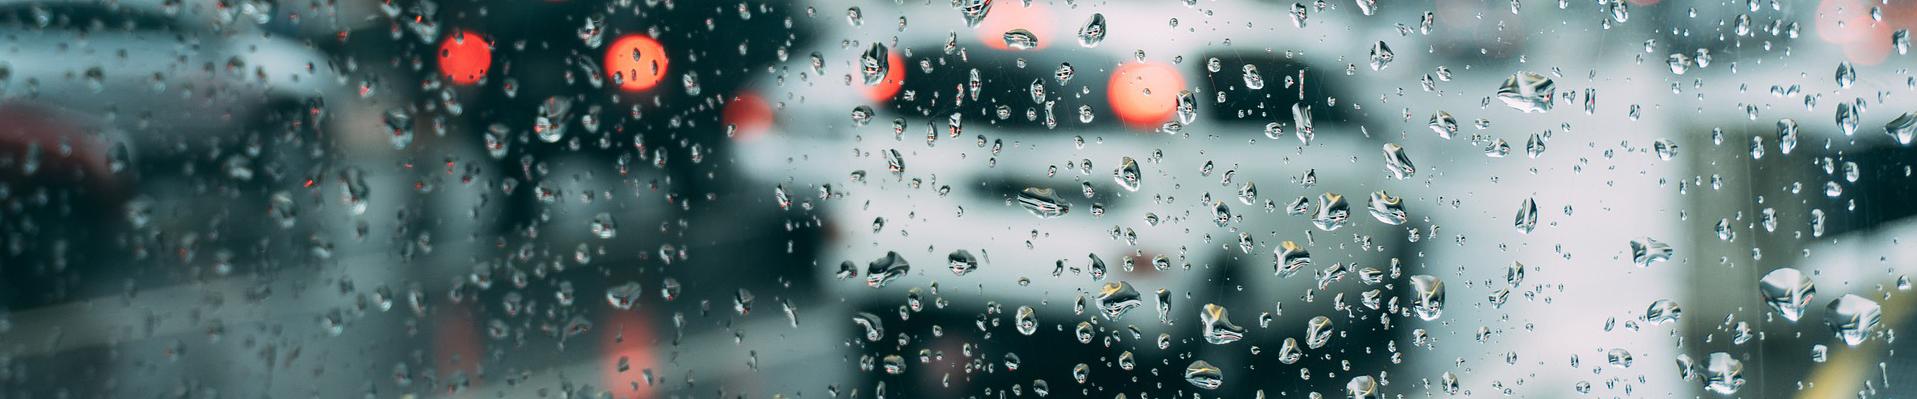 Schlechtes Wetter meiden..